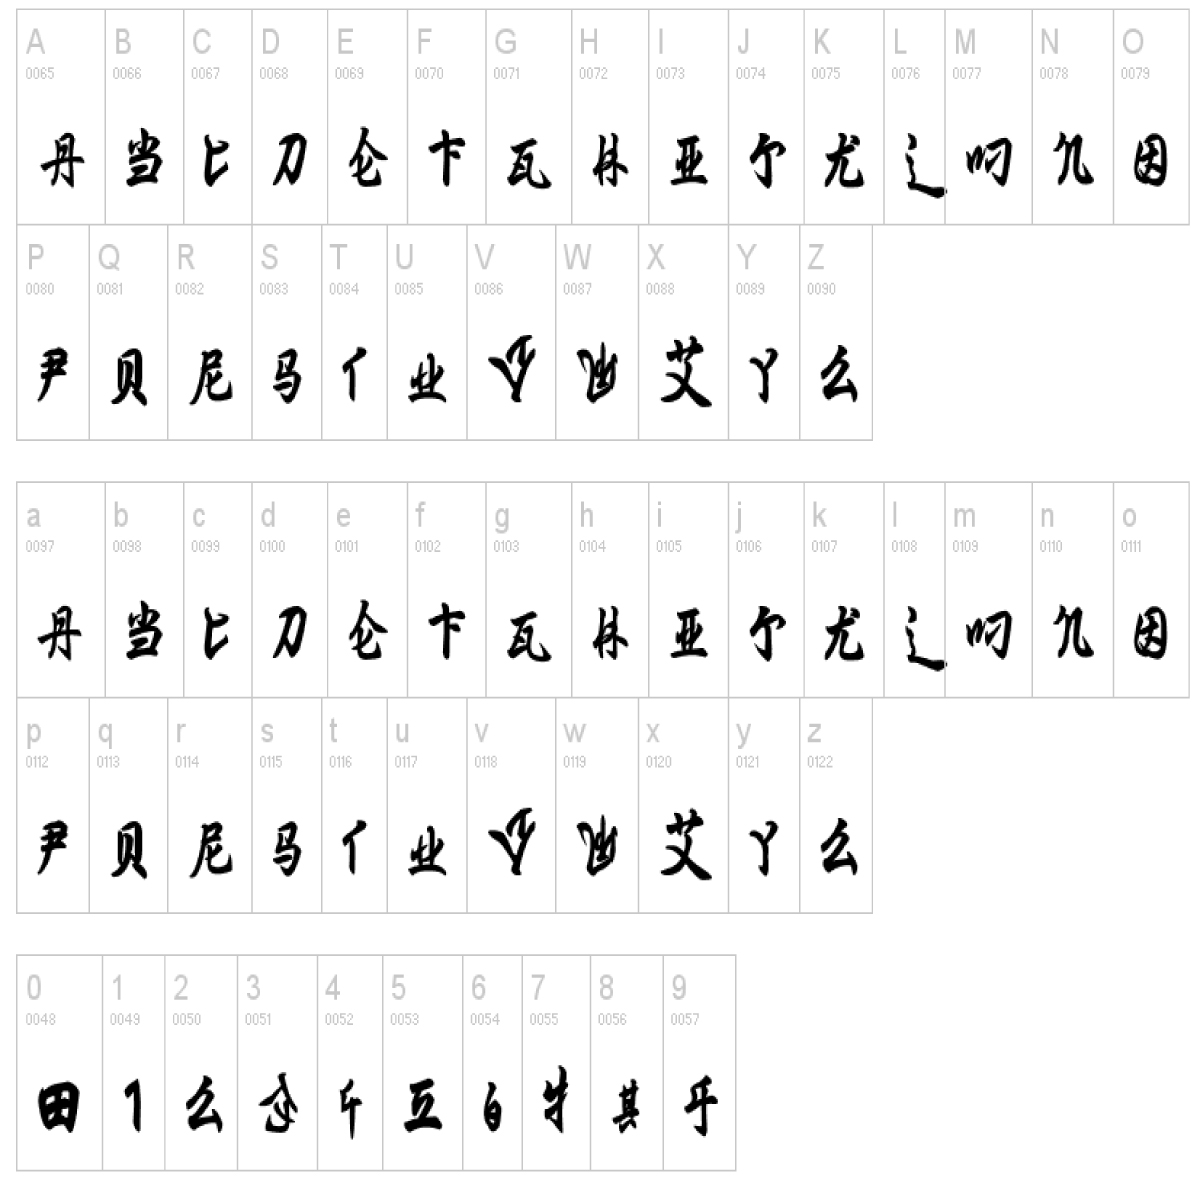 Stickers muraux prénom sticker s calligraphie japonaise